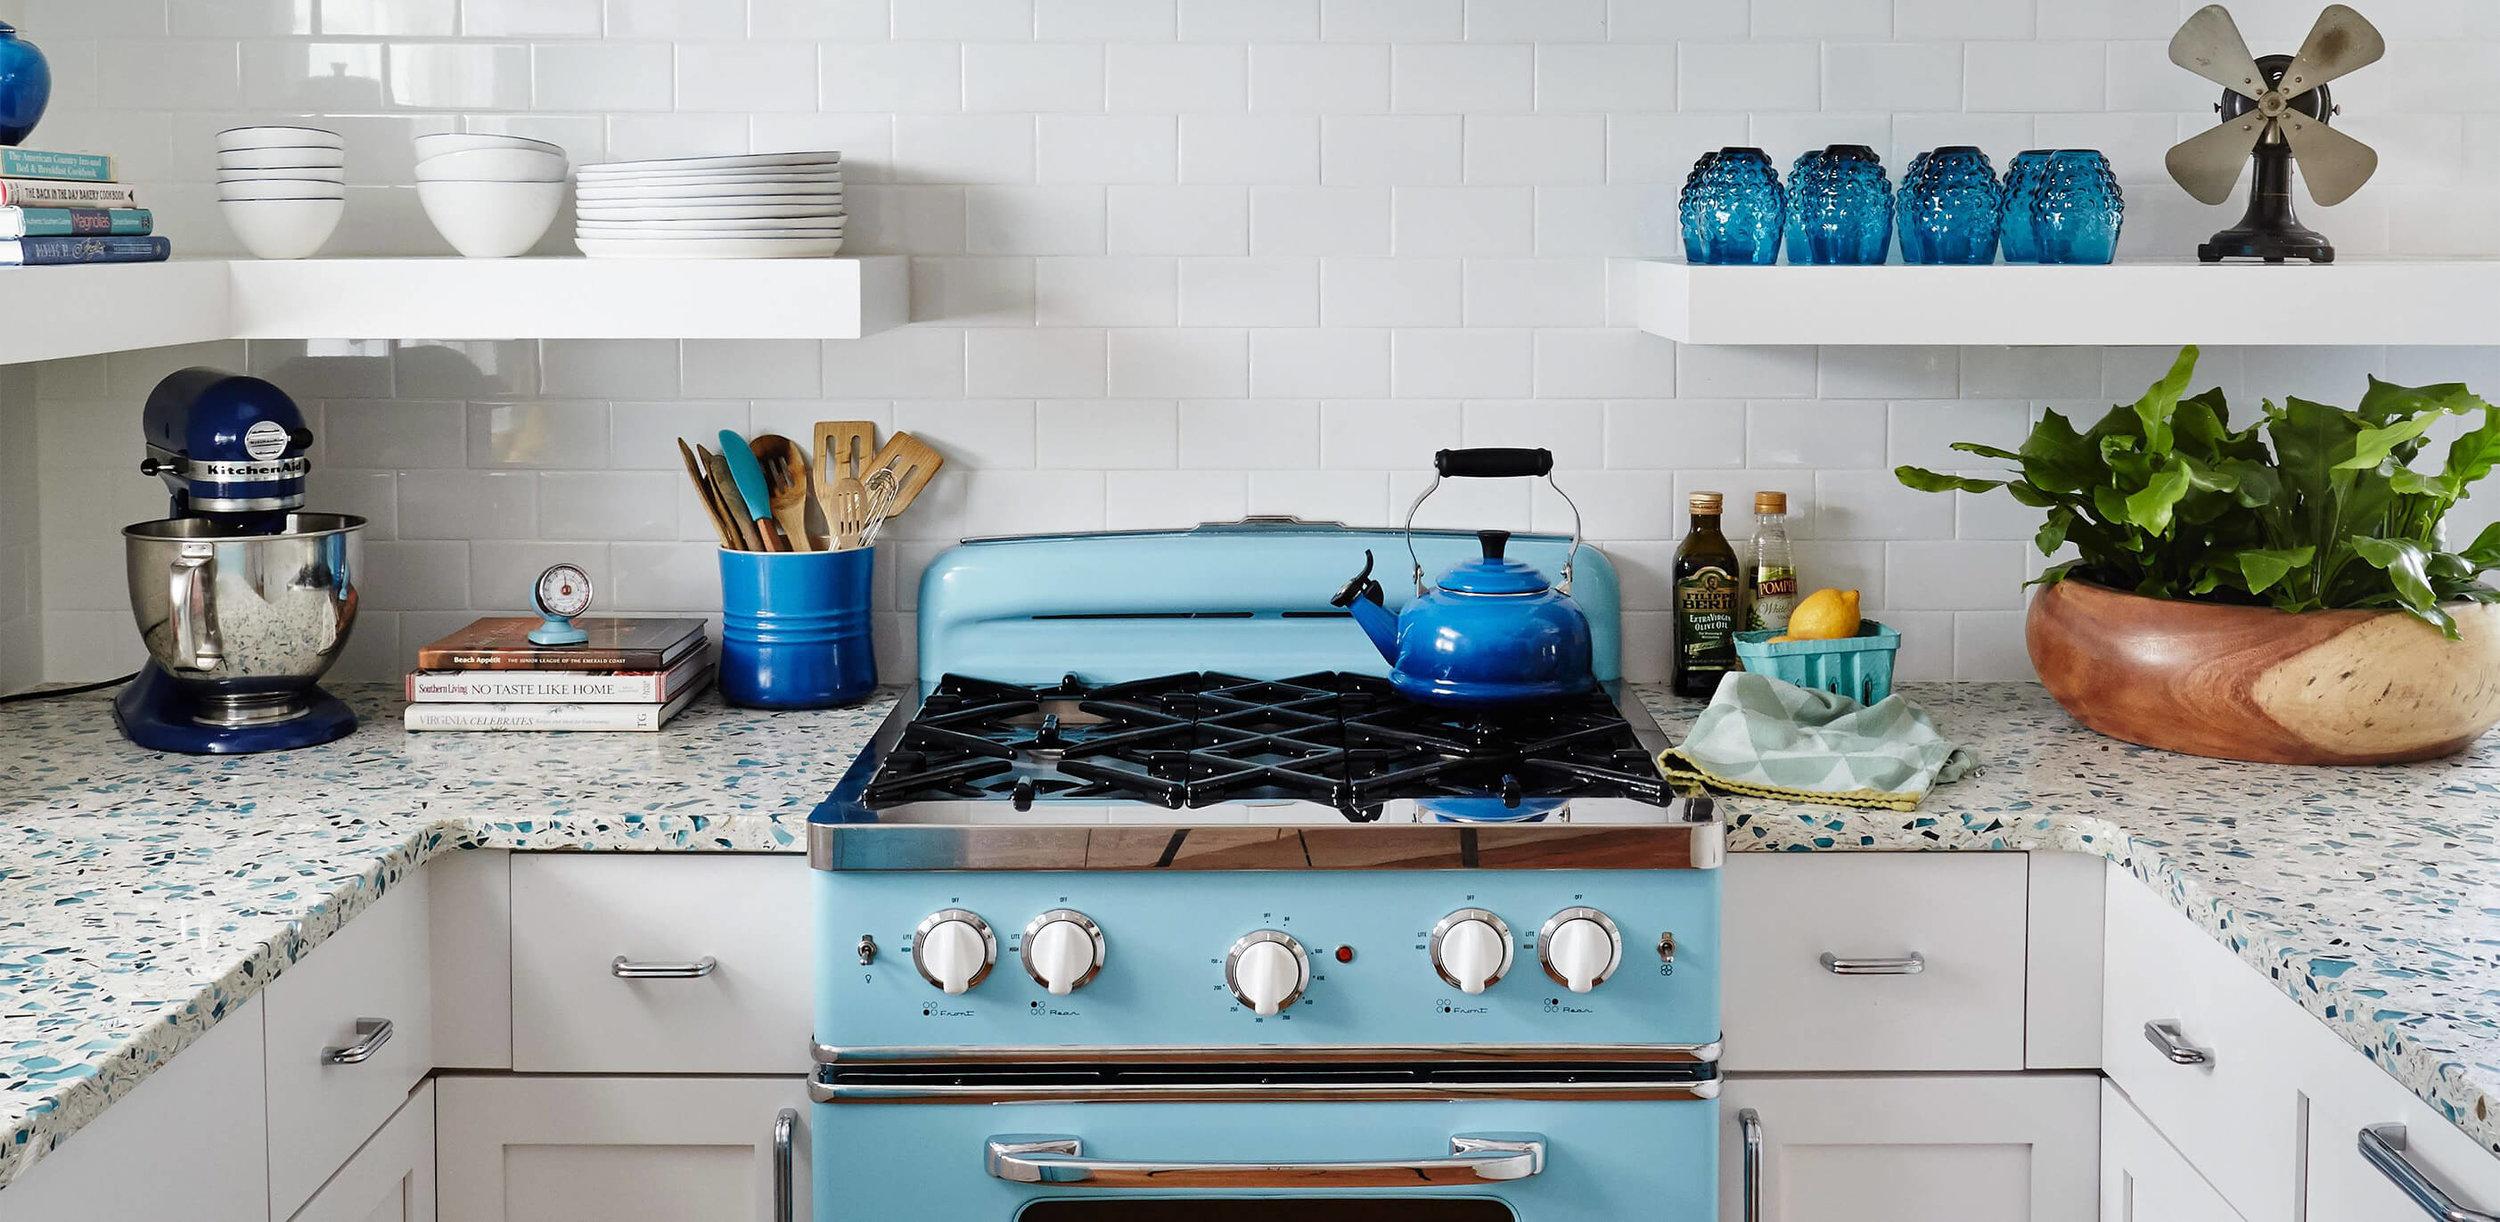 Terrazzo looks beautiful in a retro kitchen